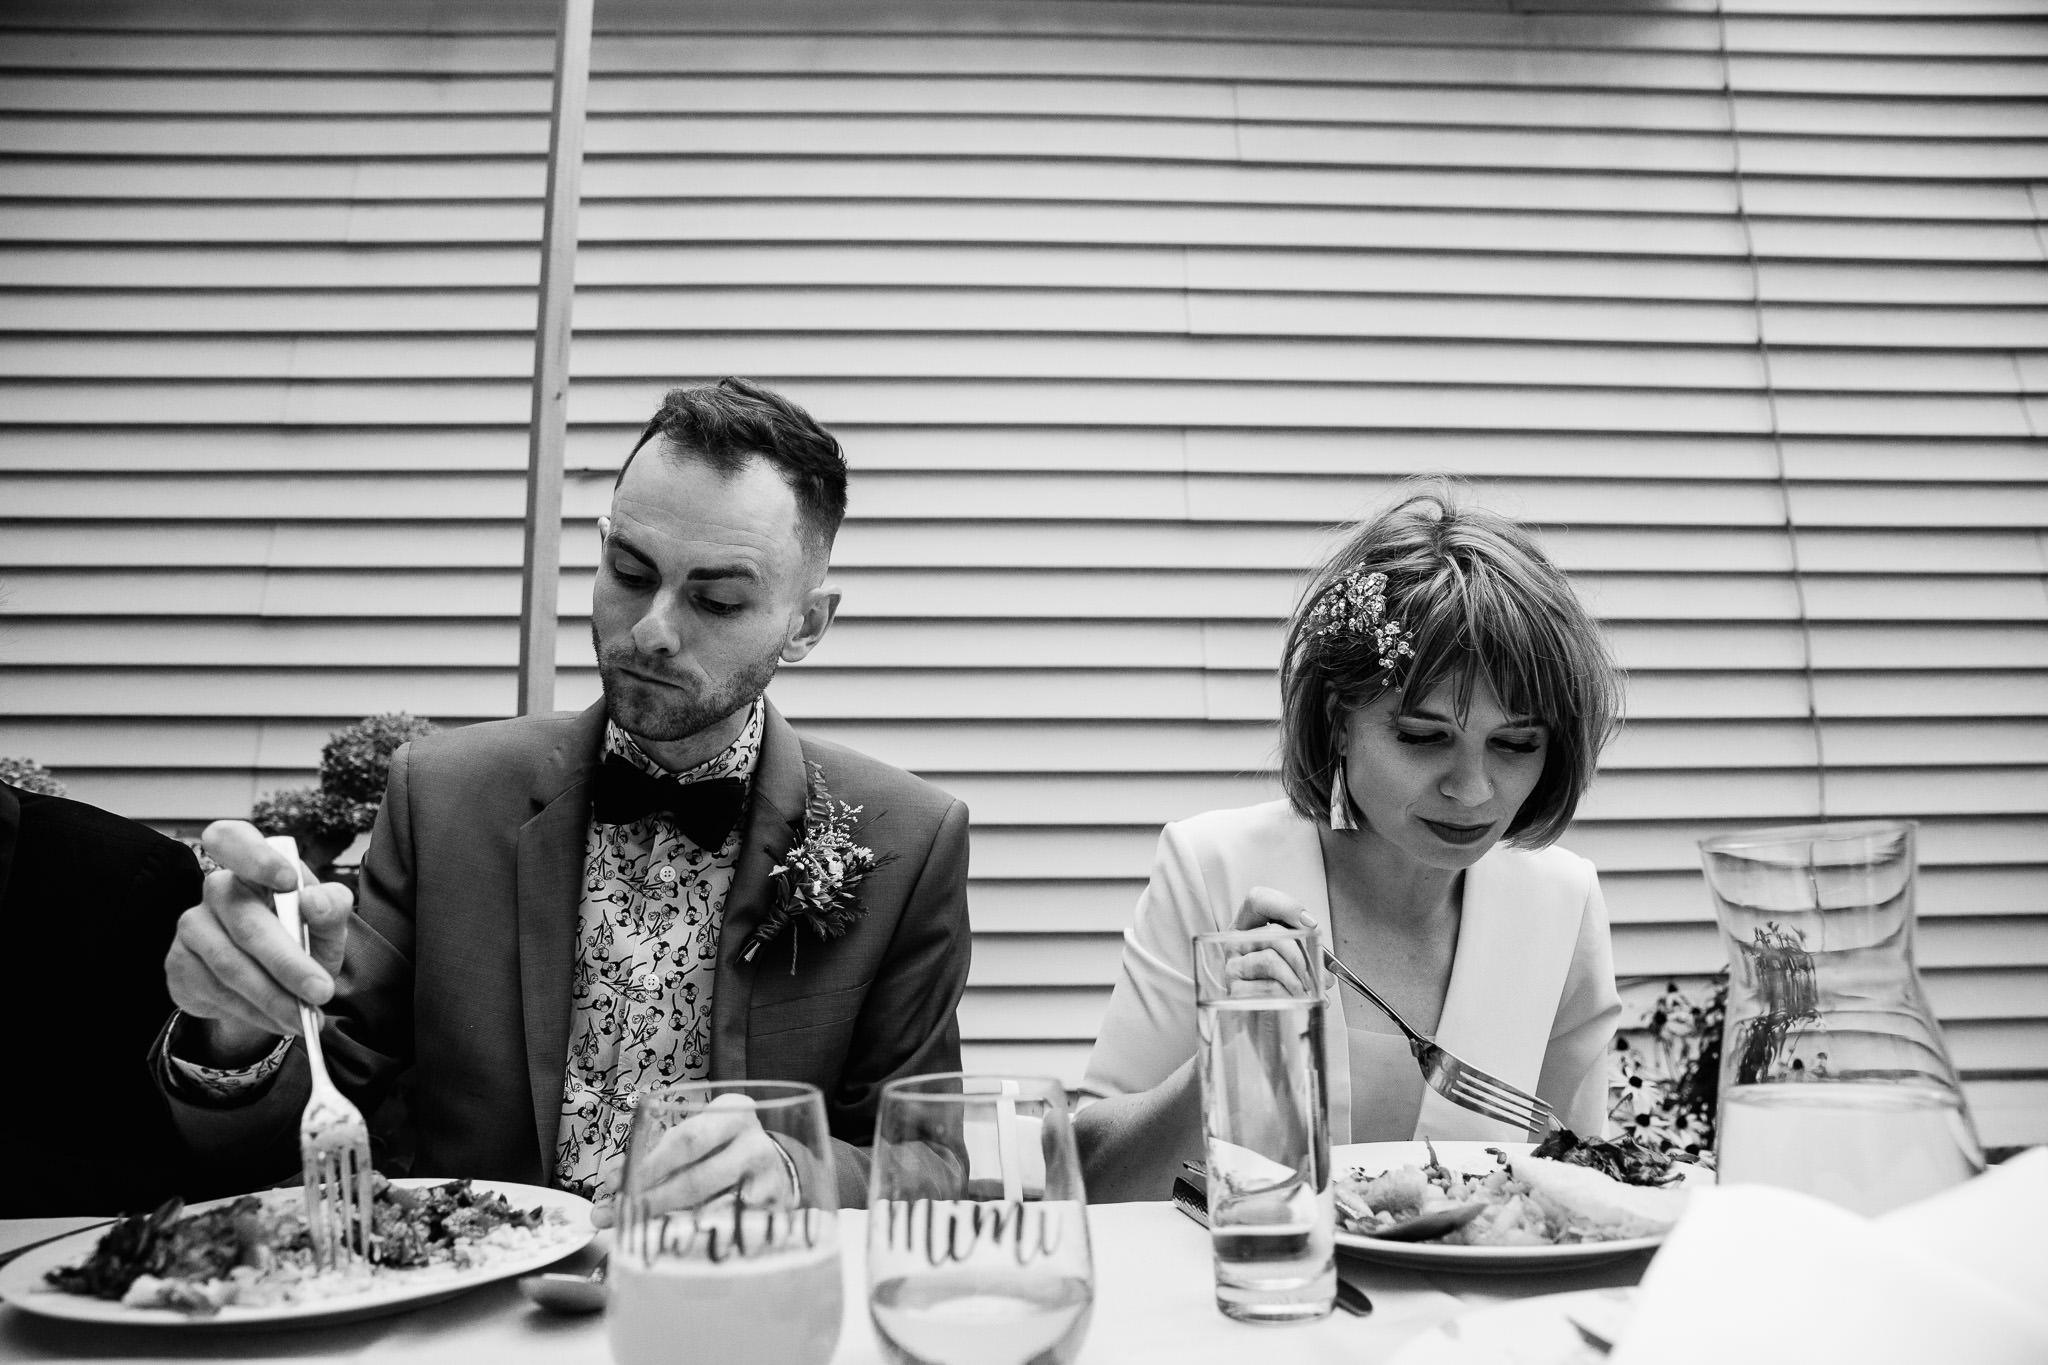 059_Canada-documentary-wedding-photograp